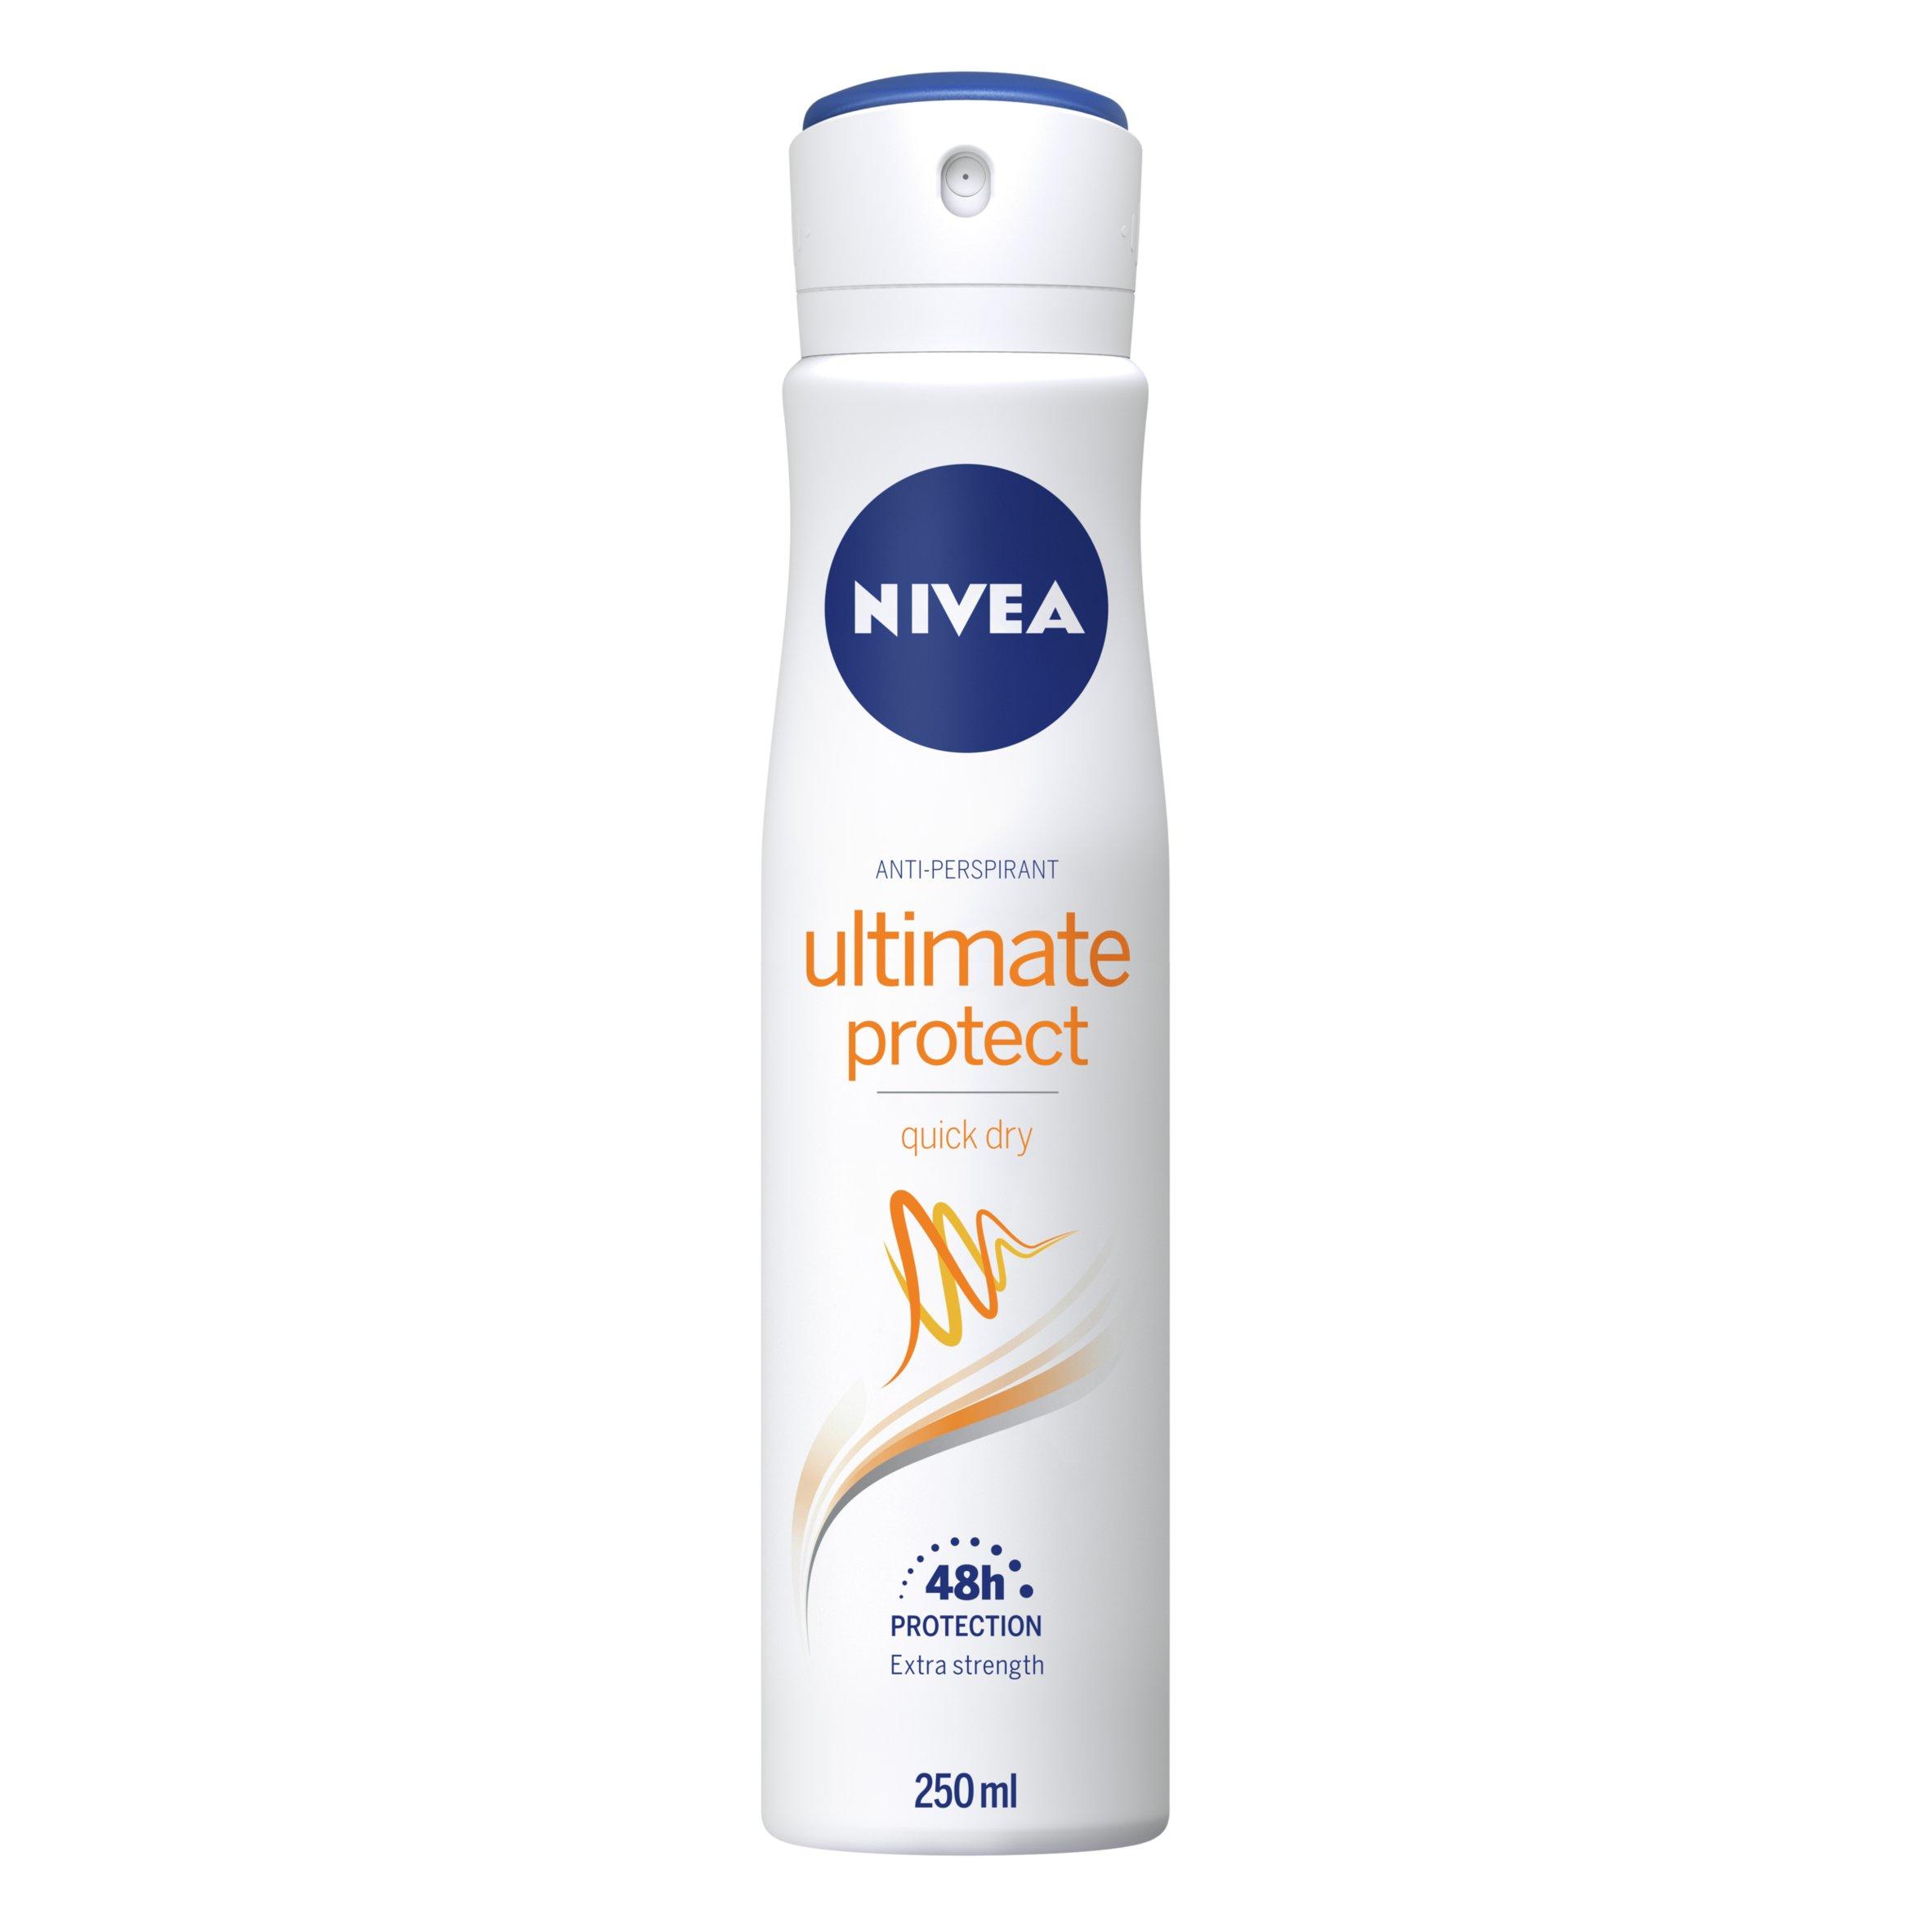 Nivea Ultimate Protect Deodorant 250Ml